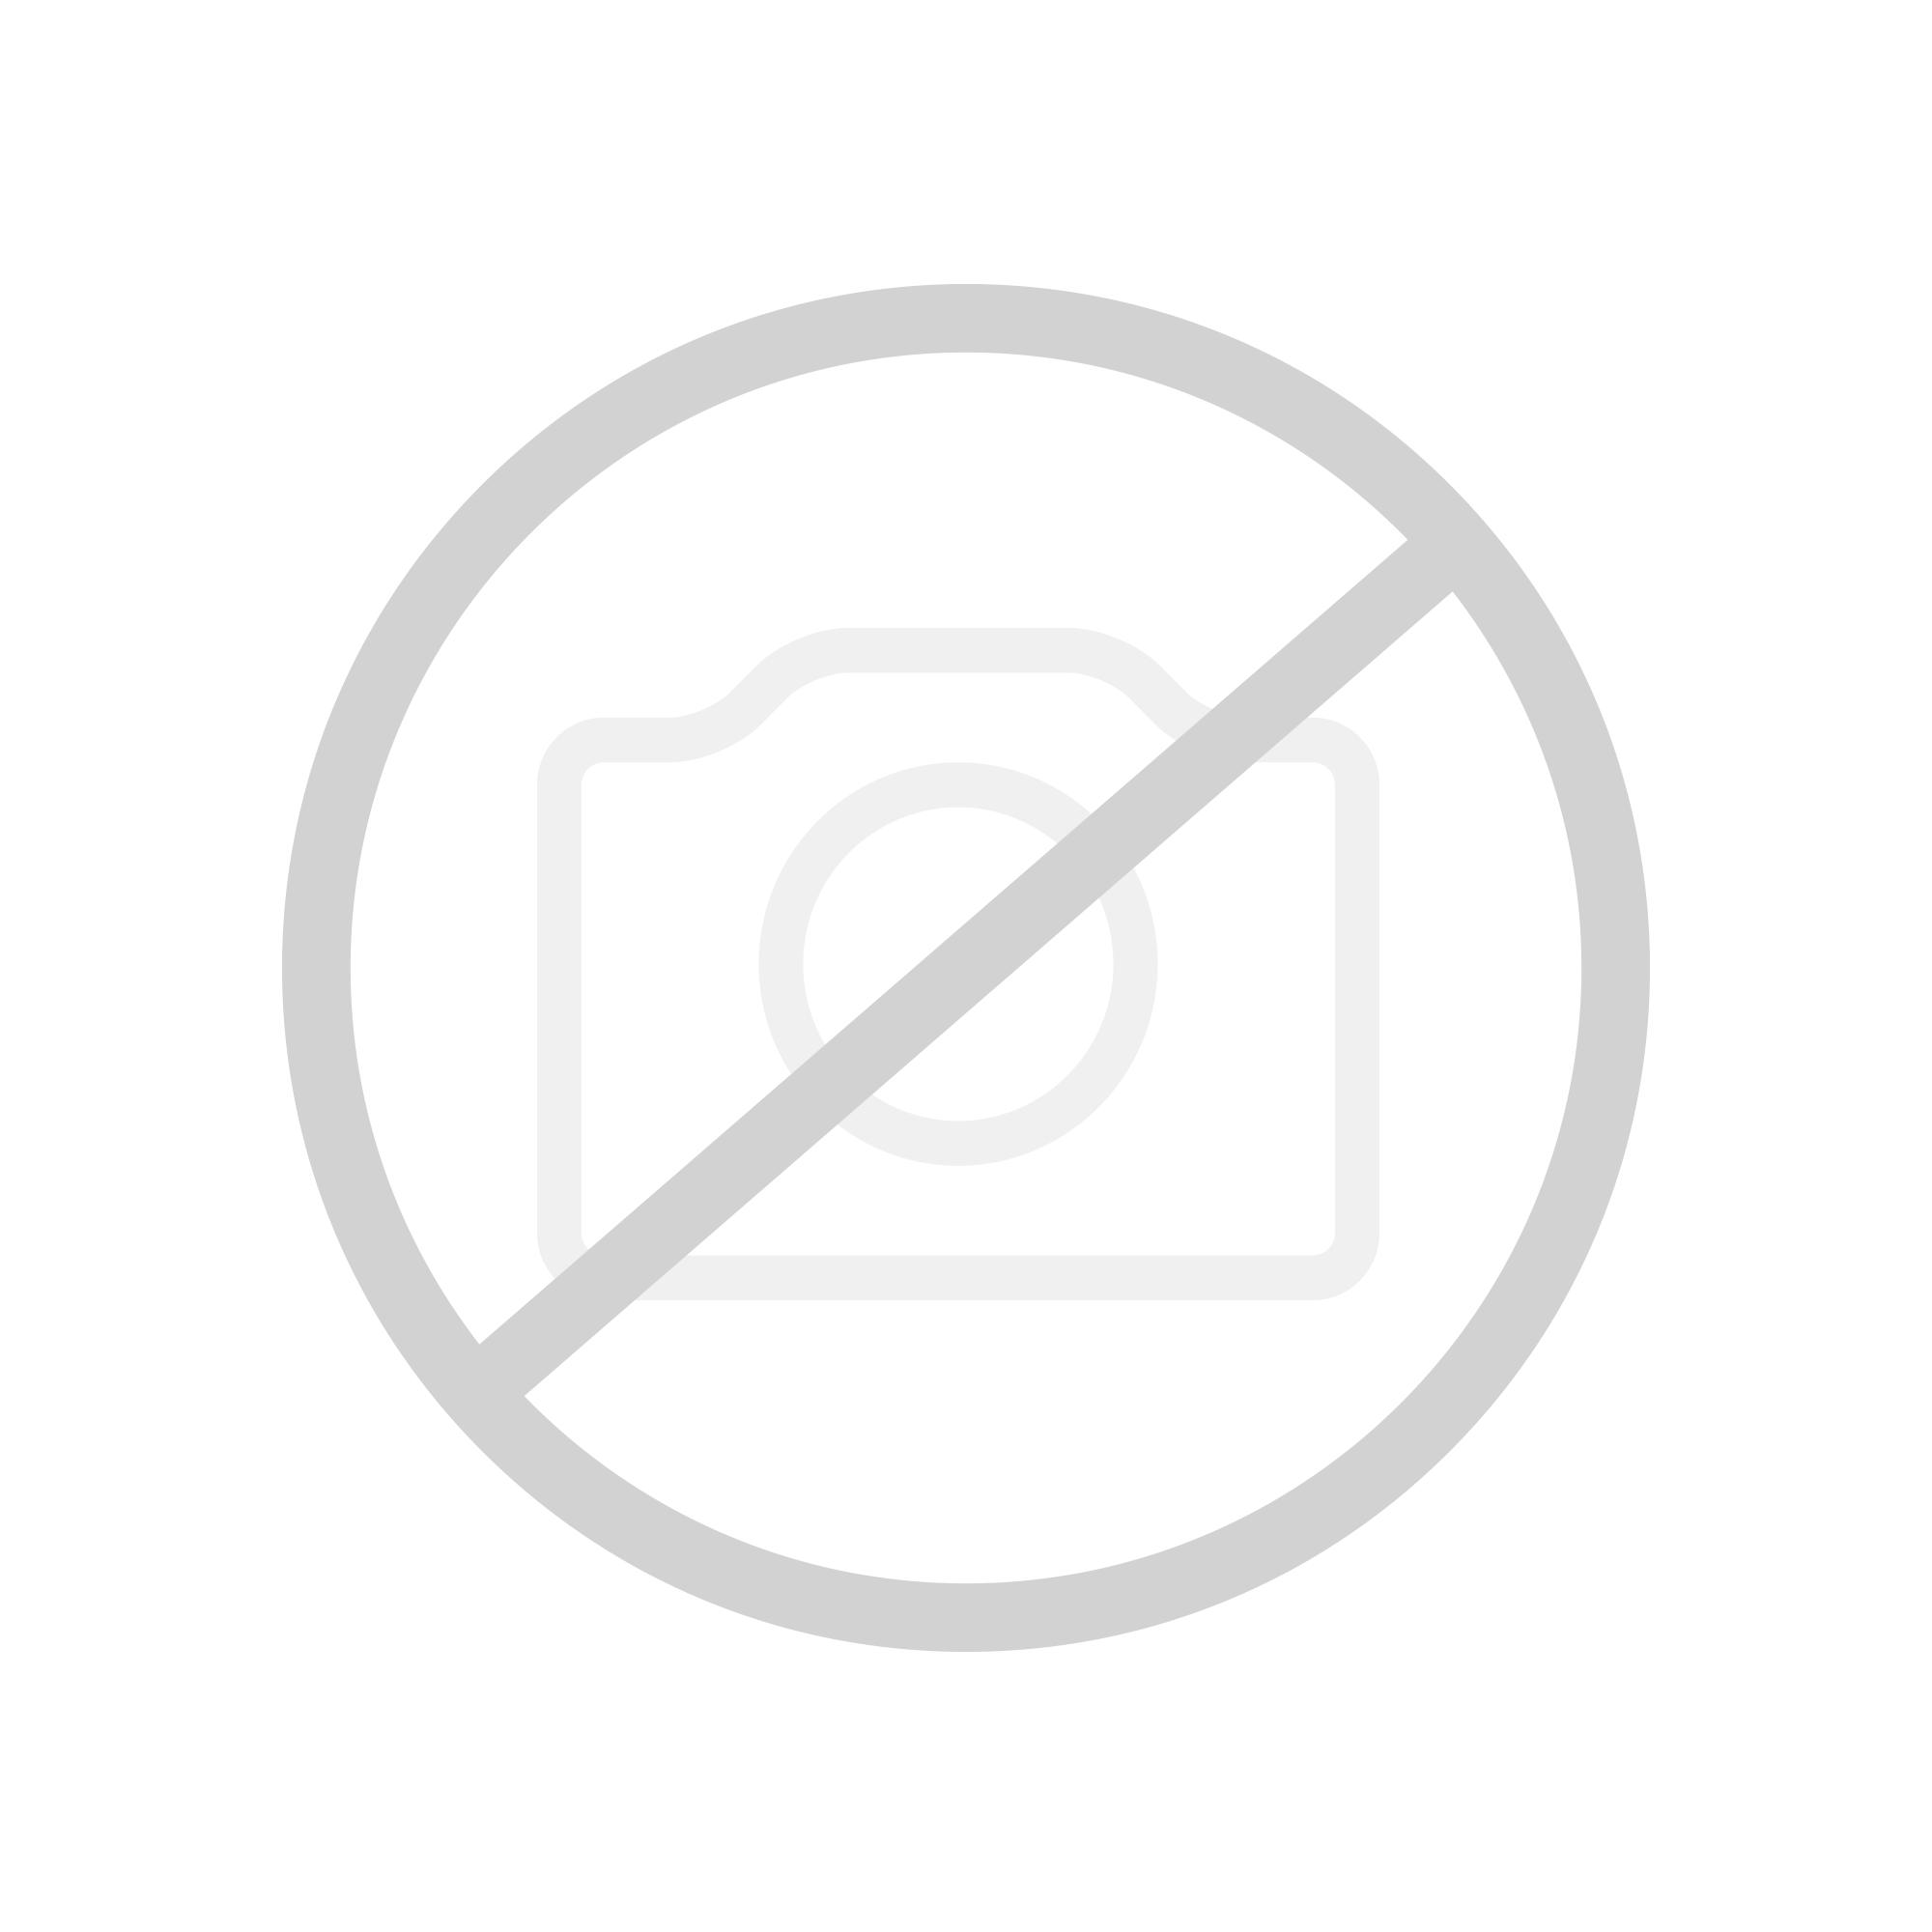 jan kurtz 360 multi tube s regal mit spiegel 490113 reuter onlineshop. Black Bedroom Furniture Sets. Home Design Ideas